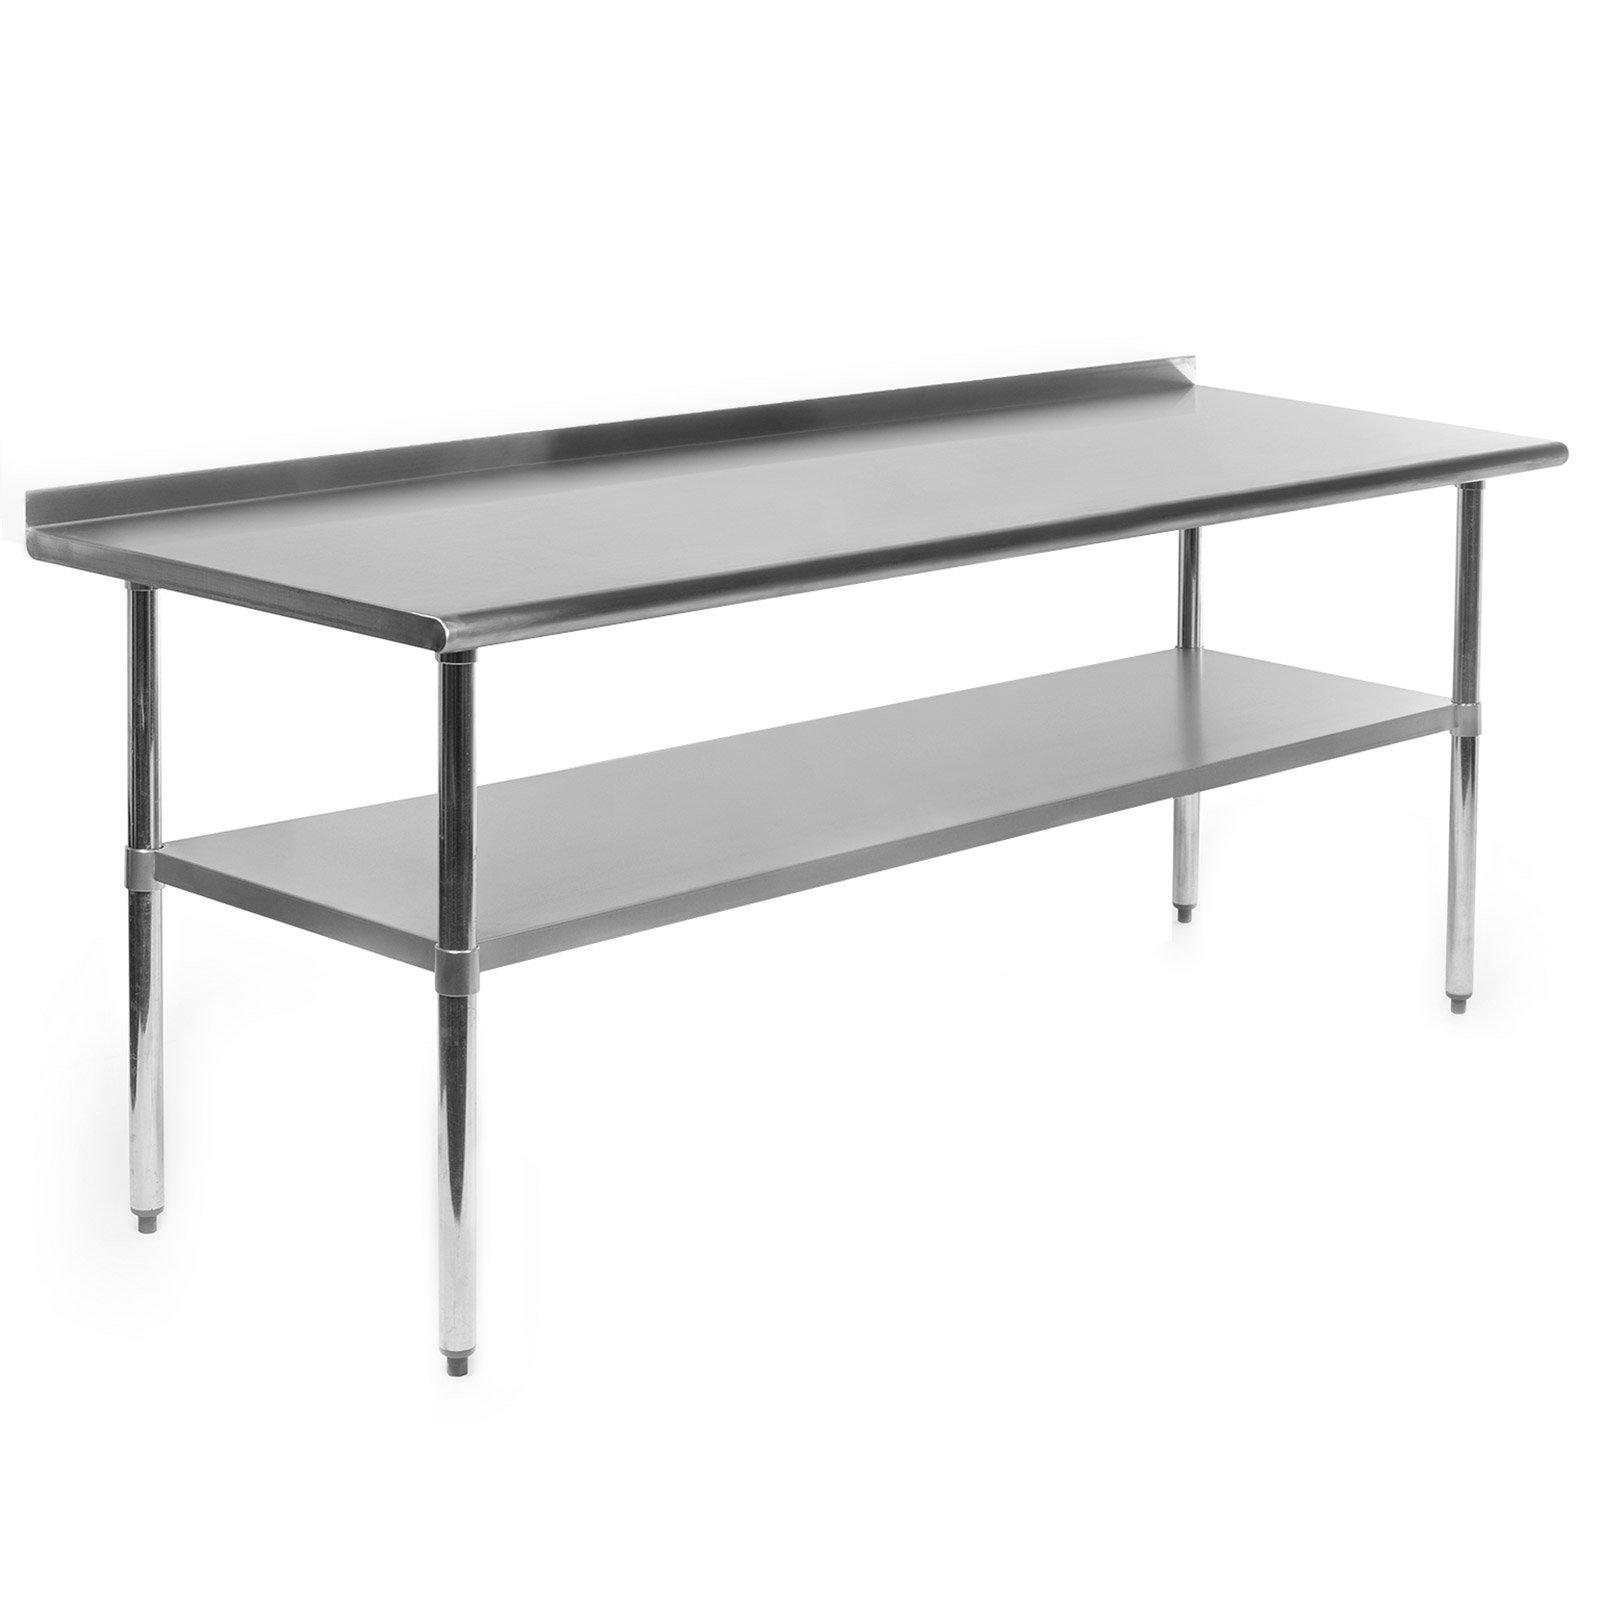 OPEN BOX – 72 x 30 Inch NSF Stainless Steel Prep Table w/ Backsplash